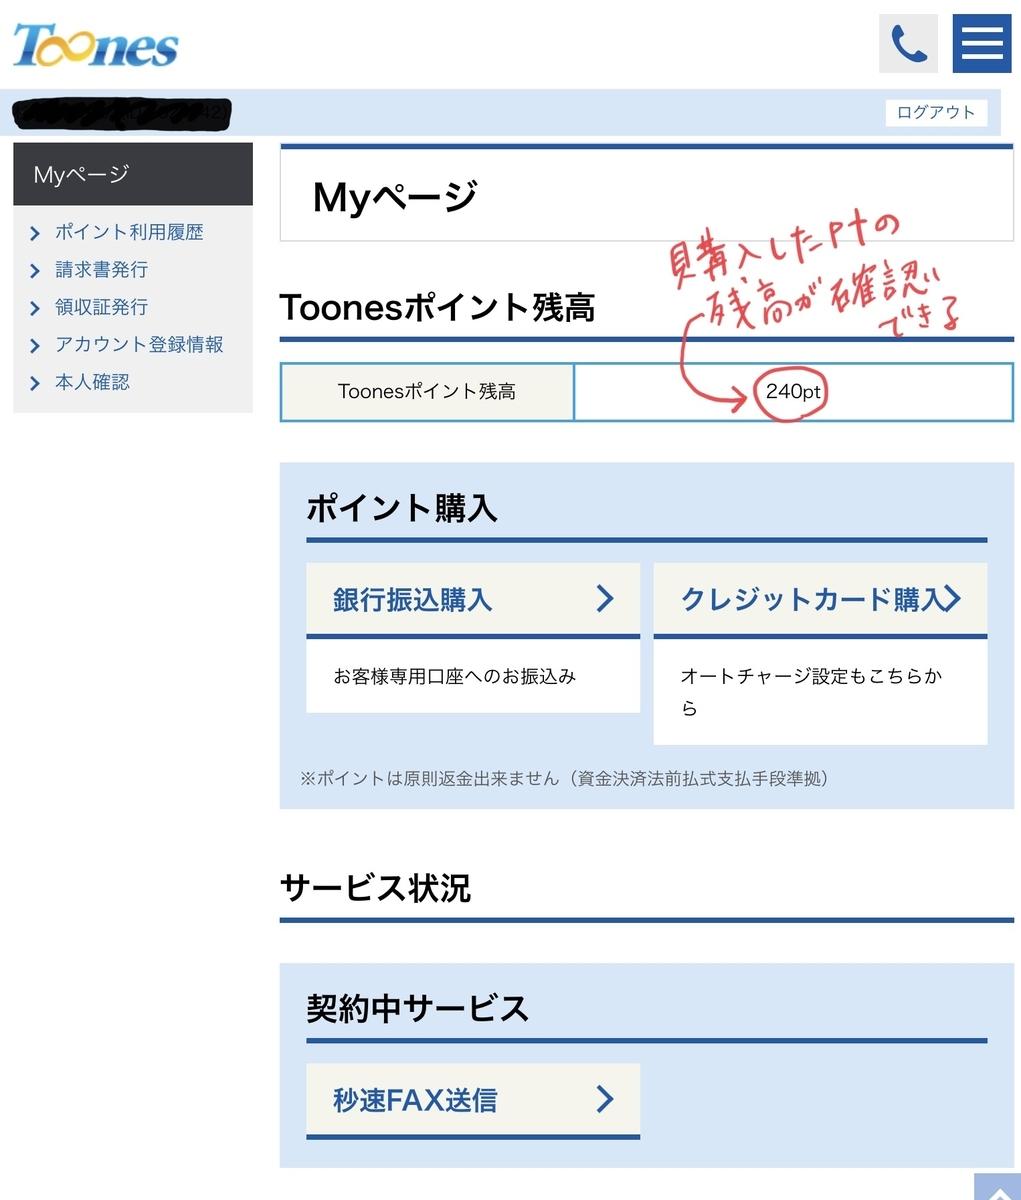 f:id:ma_sugiyama:20200404121616j:plain